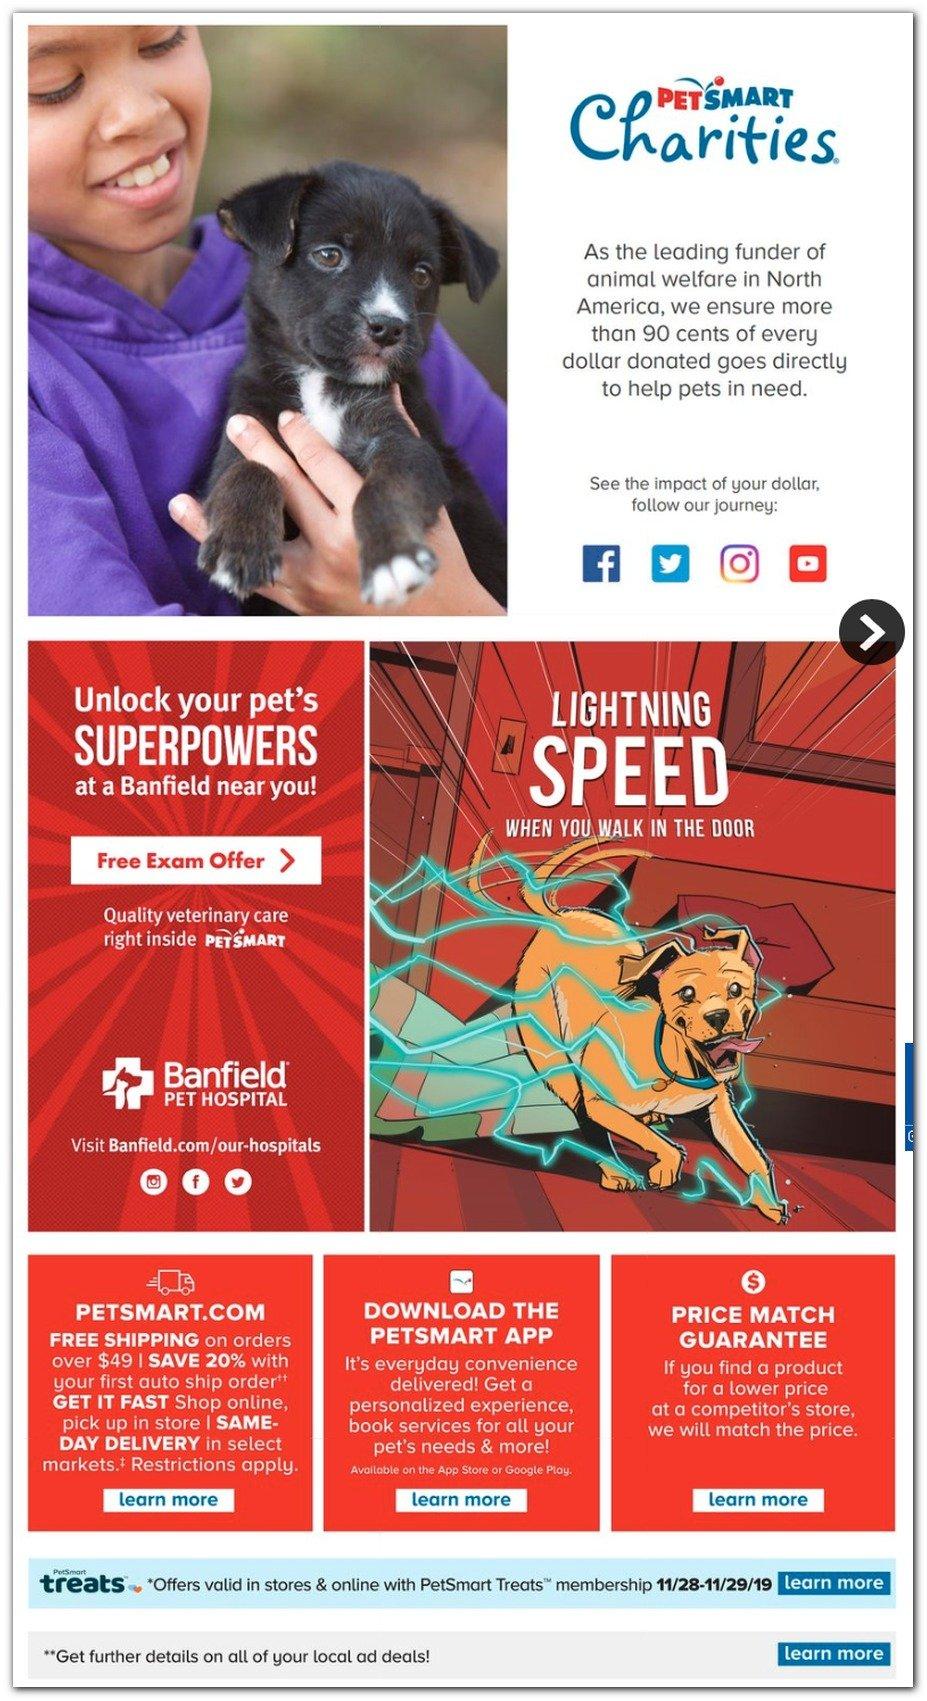 Petsmart Black Friday 2019 Page 10